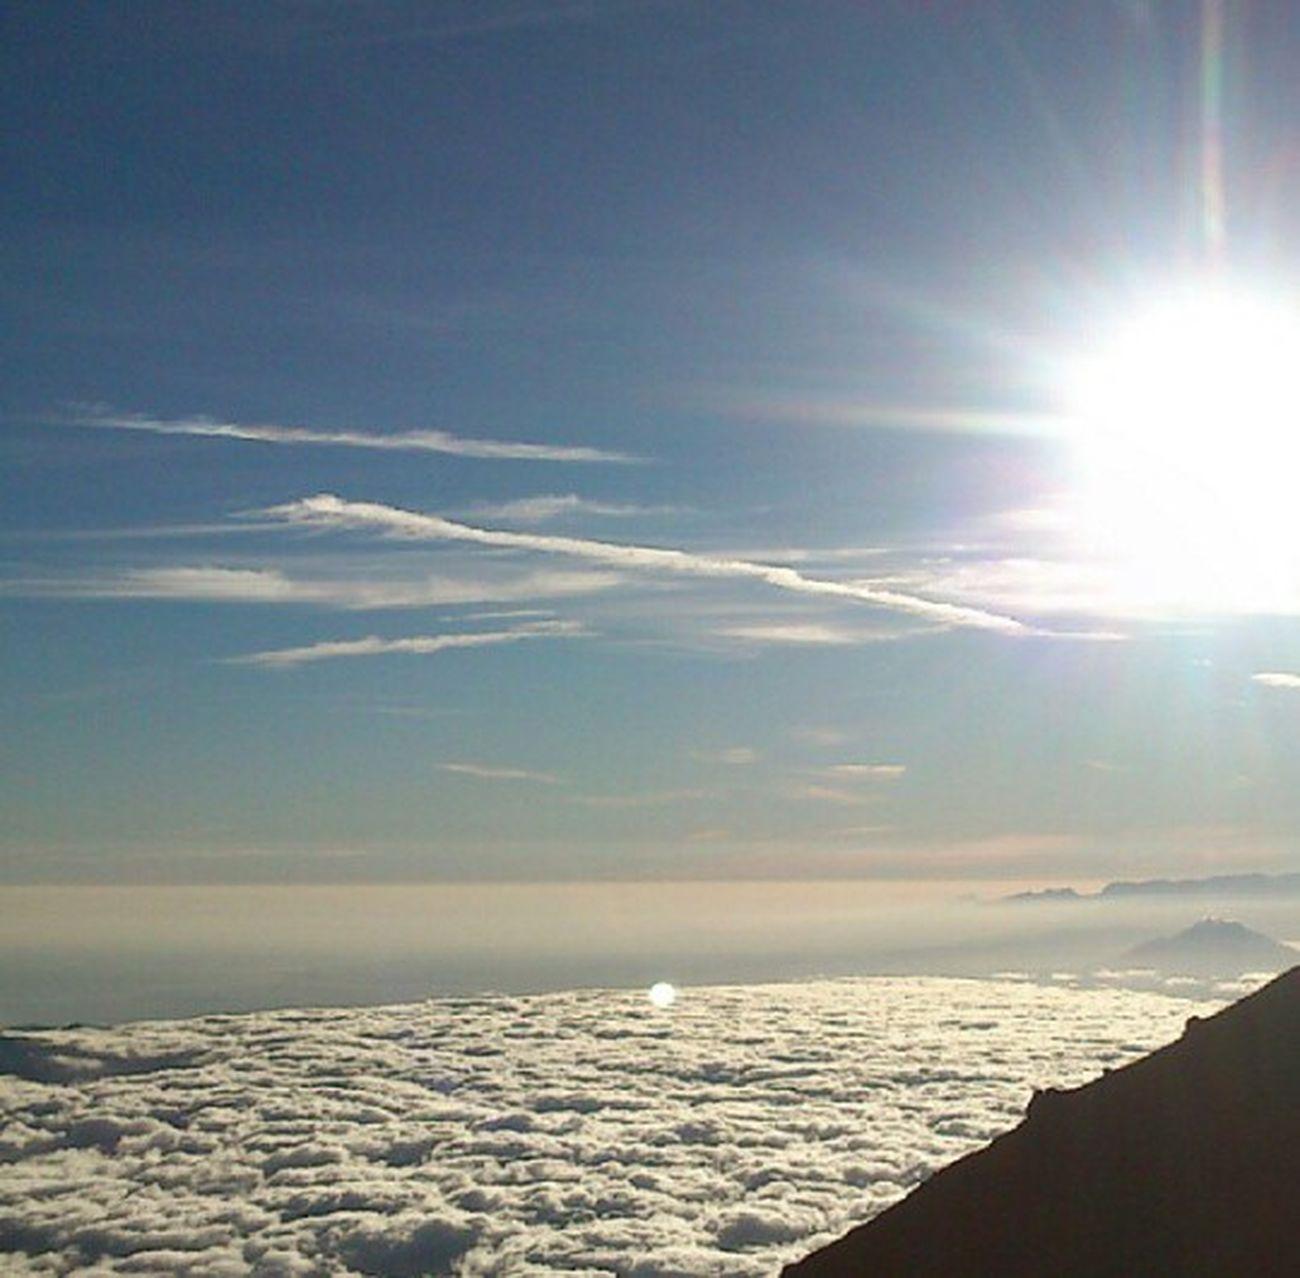 One day at puncak semeru... Hikingadventures indonesia indah..